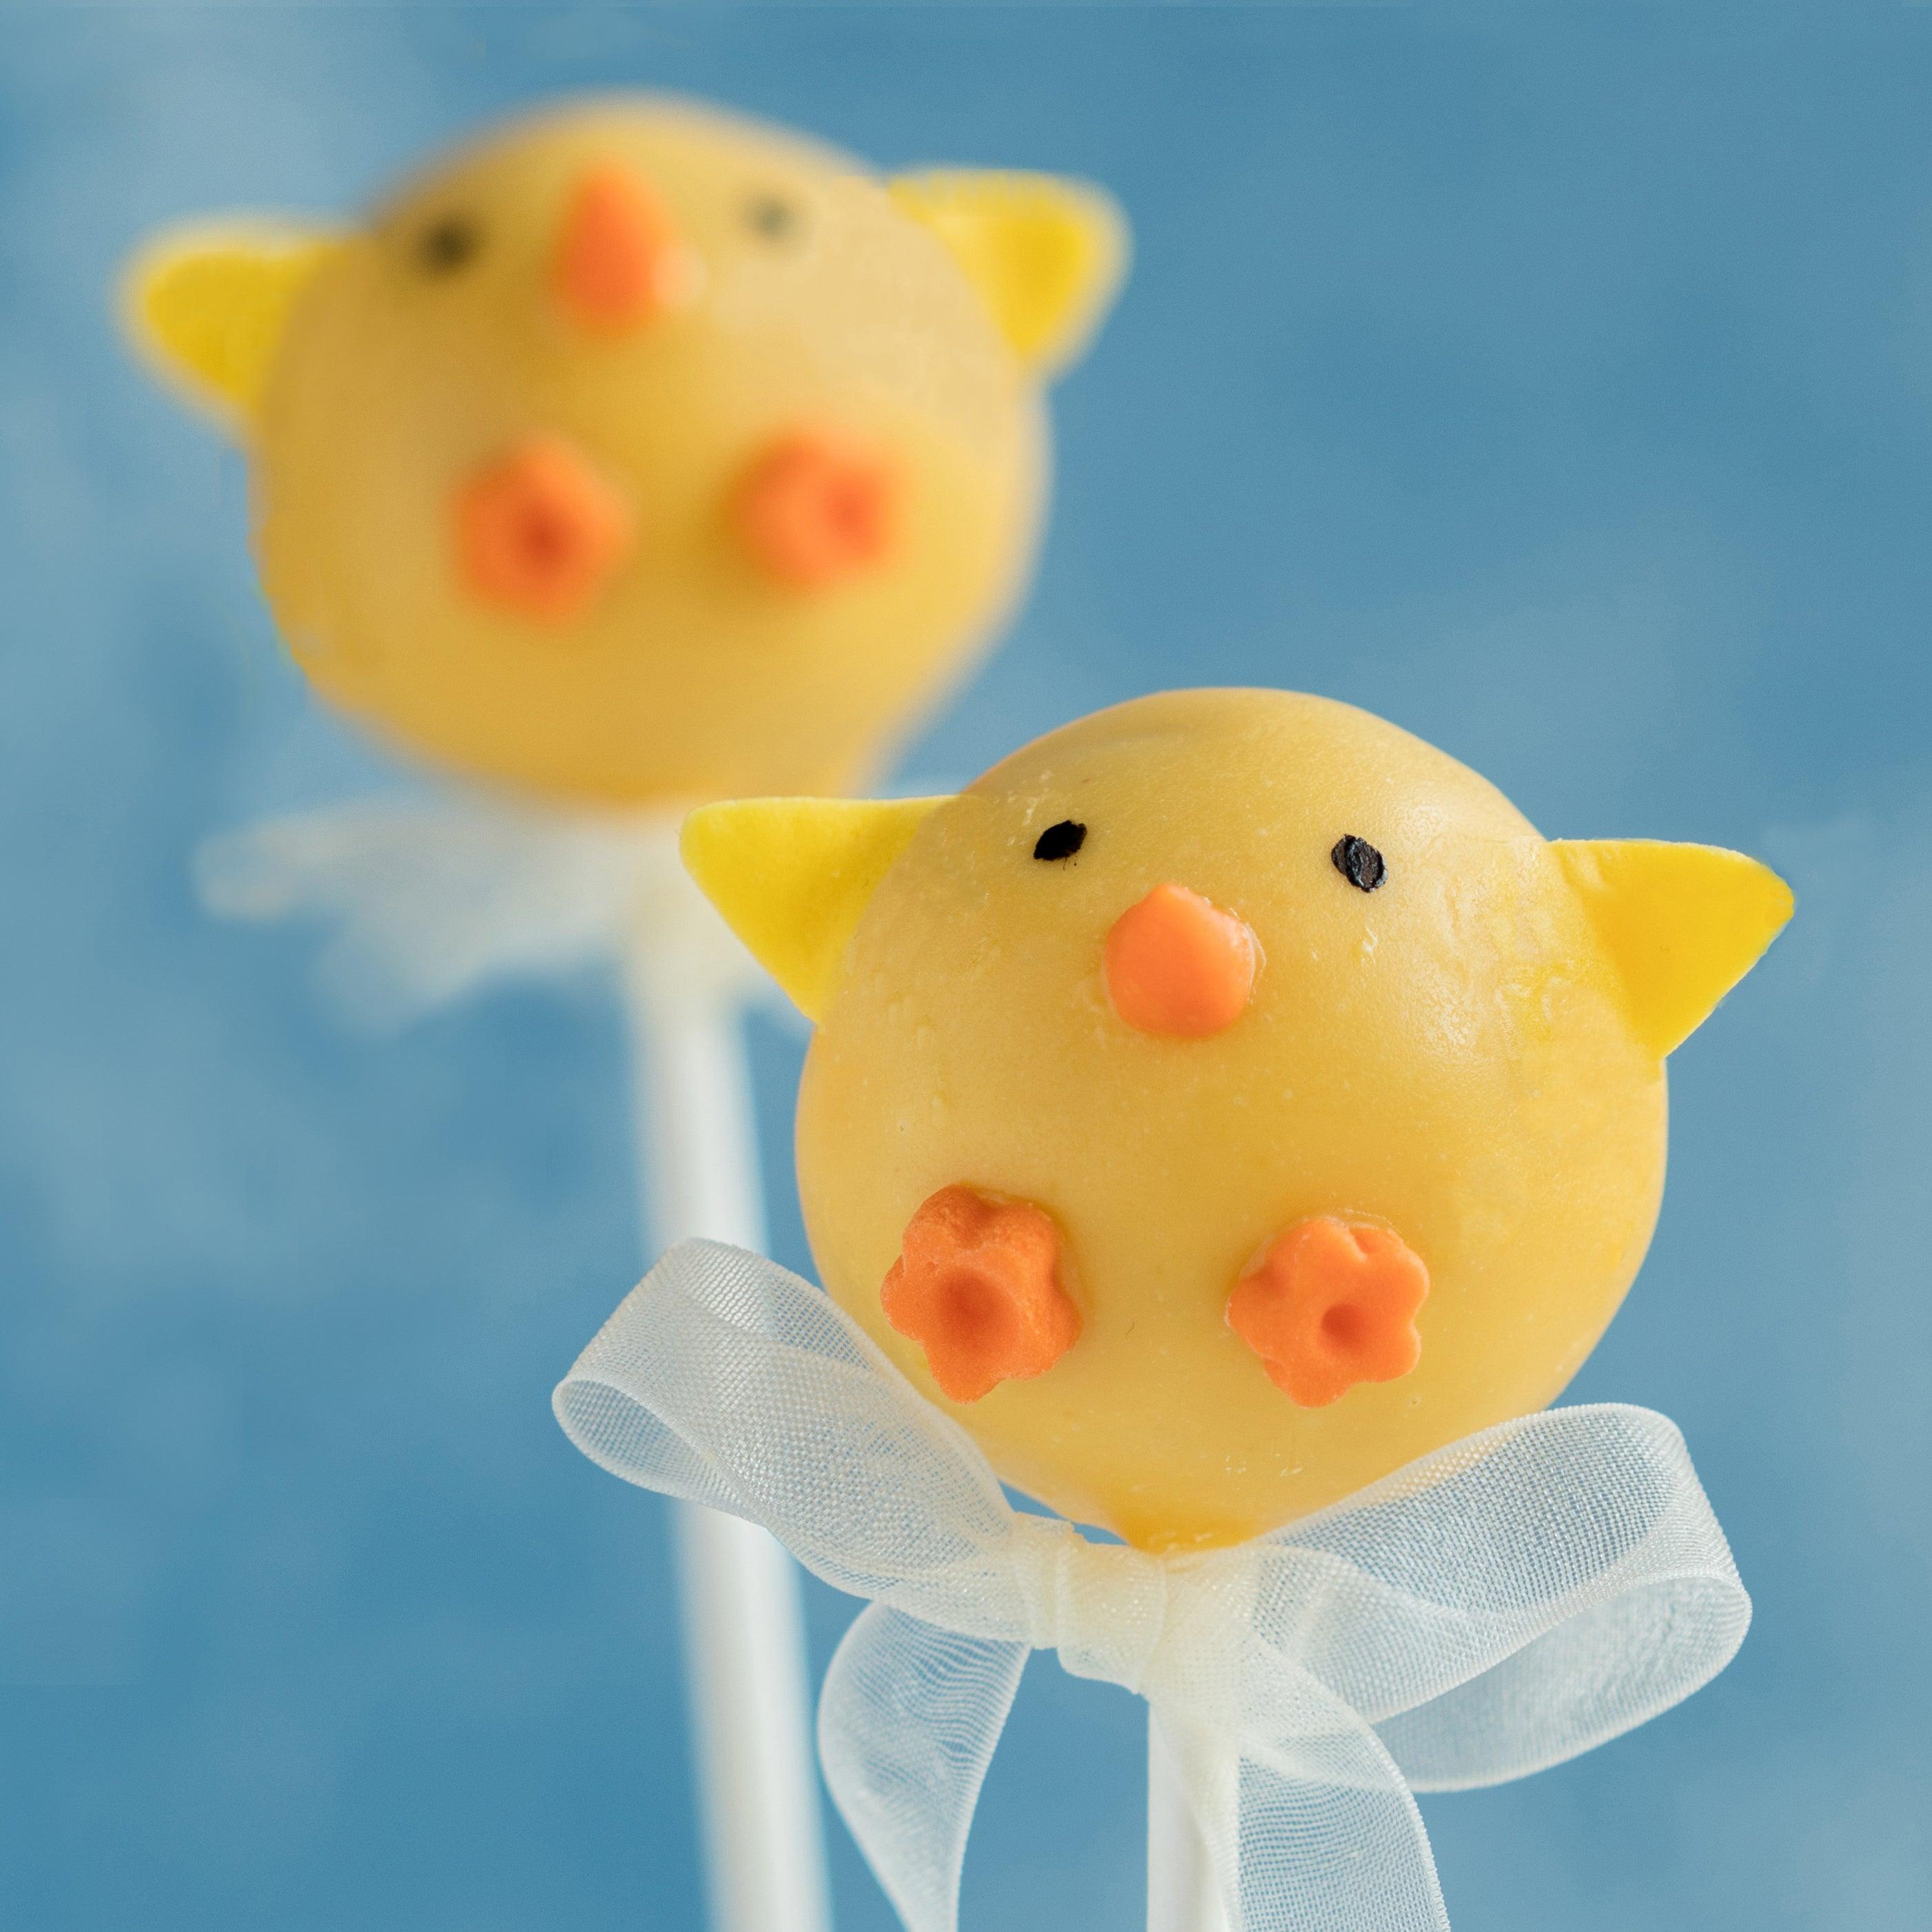 Cute-chick-cake-pops-square.jpg